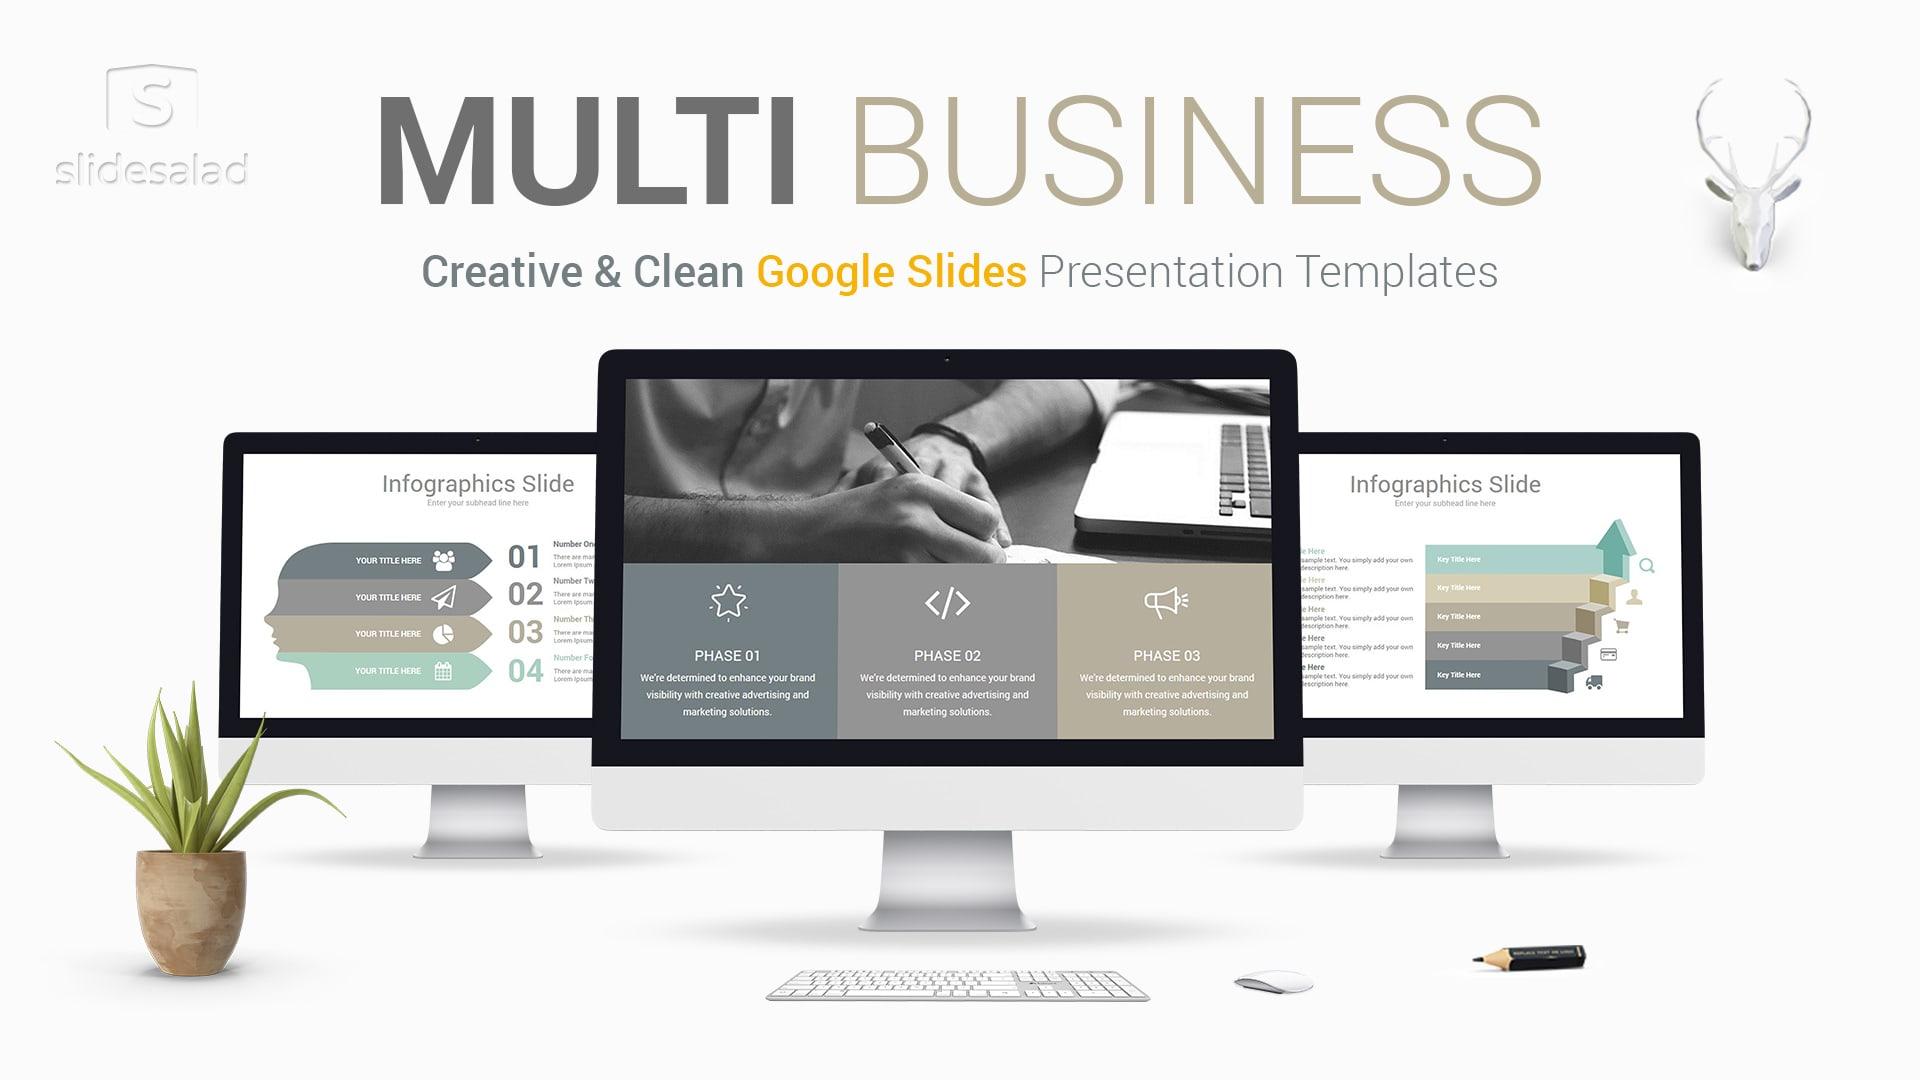 Multi Business Google Slides Presentation Template - Google Slides Template